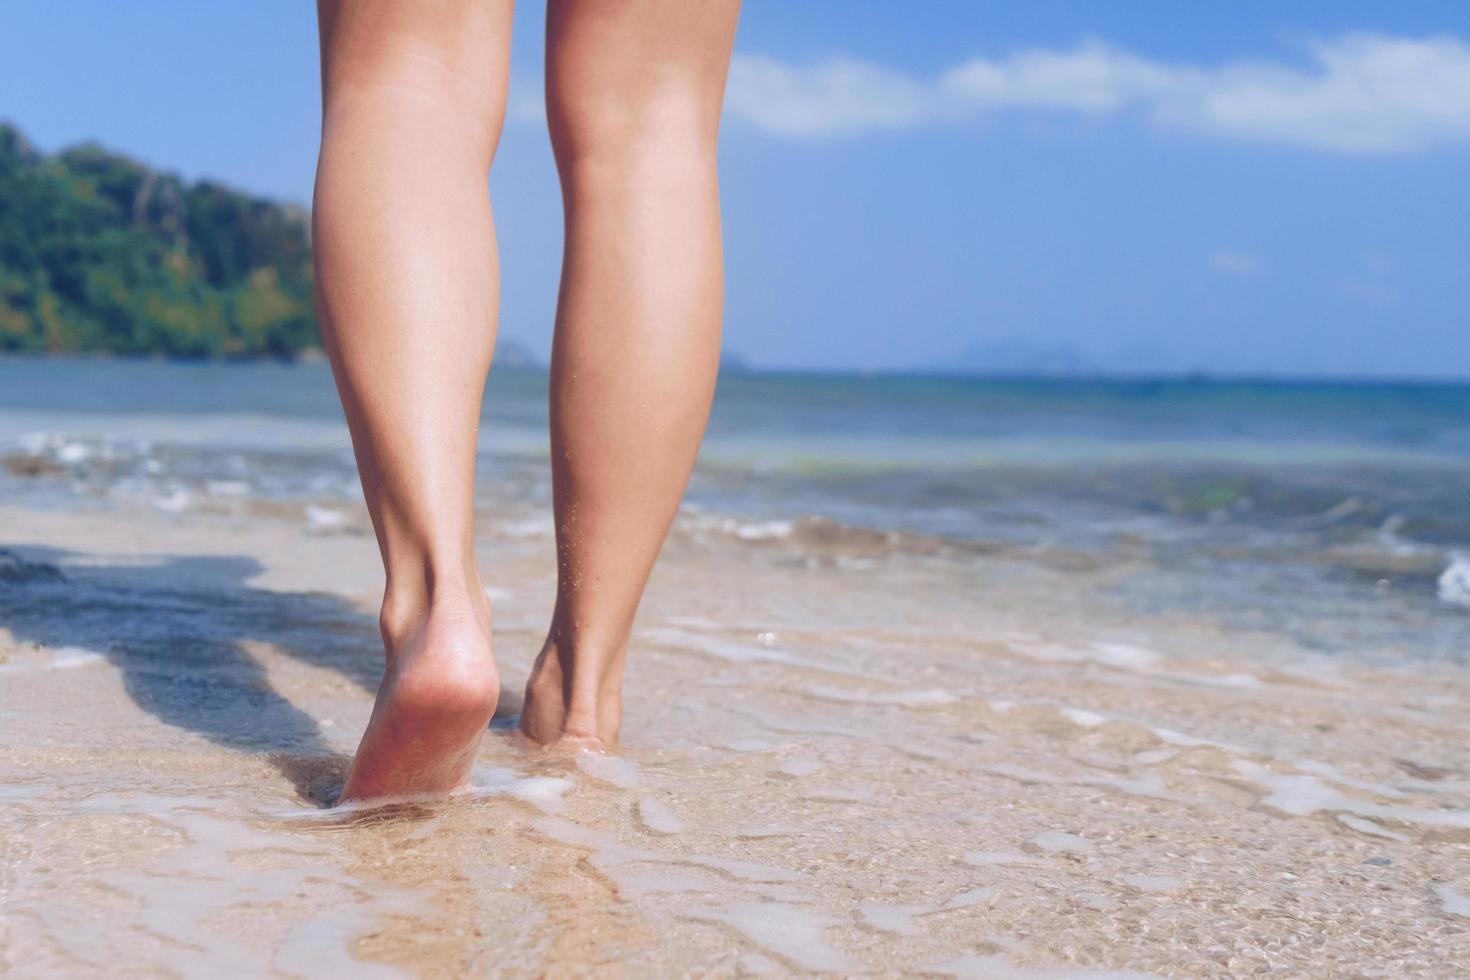 Woman's feet walking slowly on sandy tropical beach photo